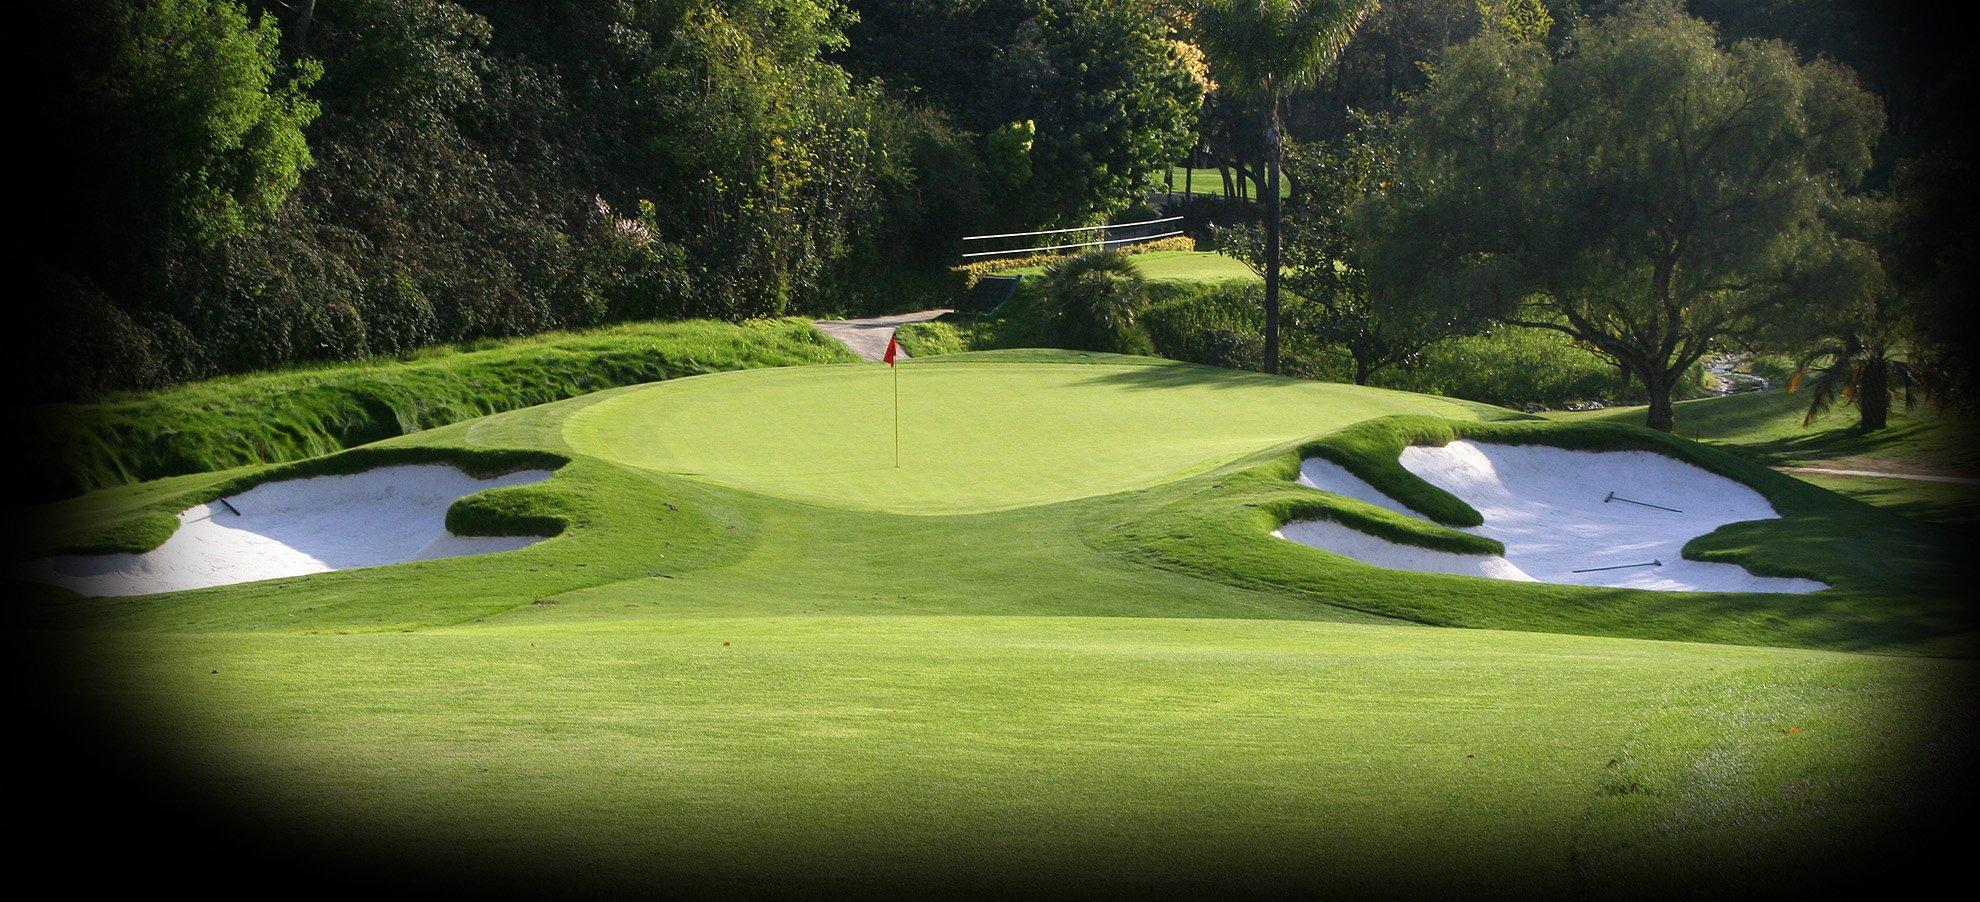 Haciendo Golf Club California Map.Hacienda Private Golf Club Championship Golf Course